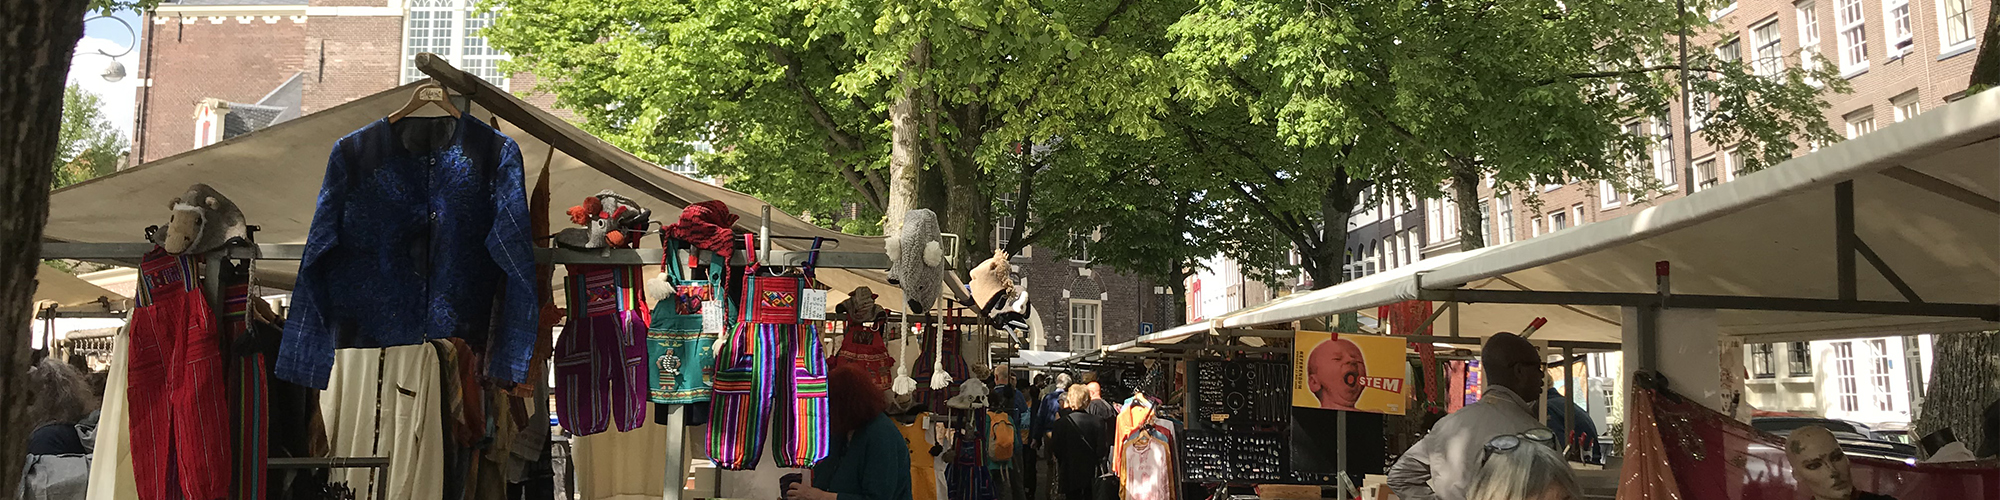 https://www.noordermarkt-amsterdam.nl/uploads/images/fotostroke/Noordermarkt-1.jpg